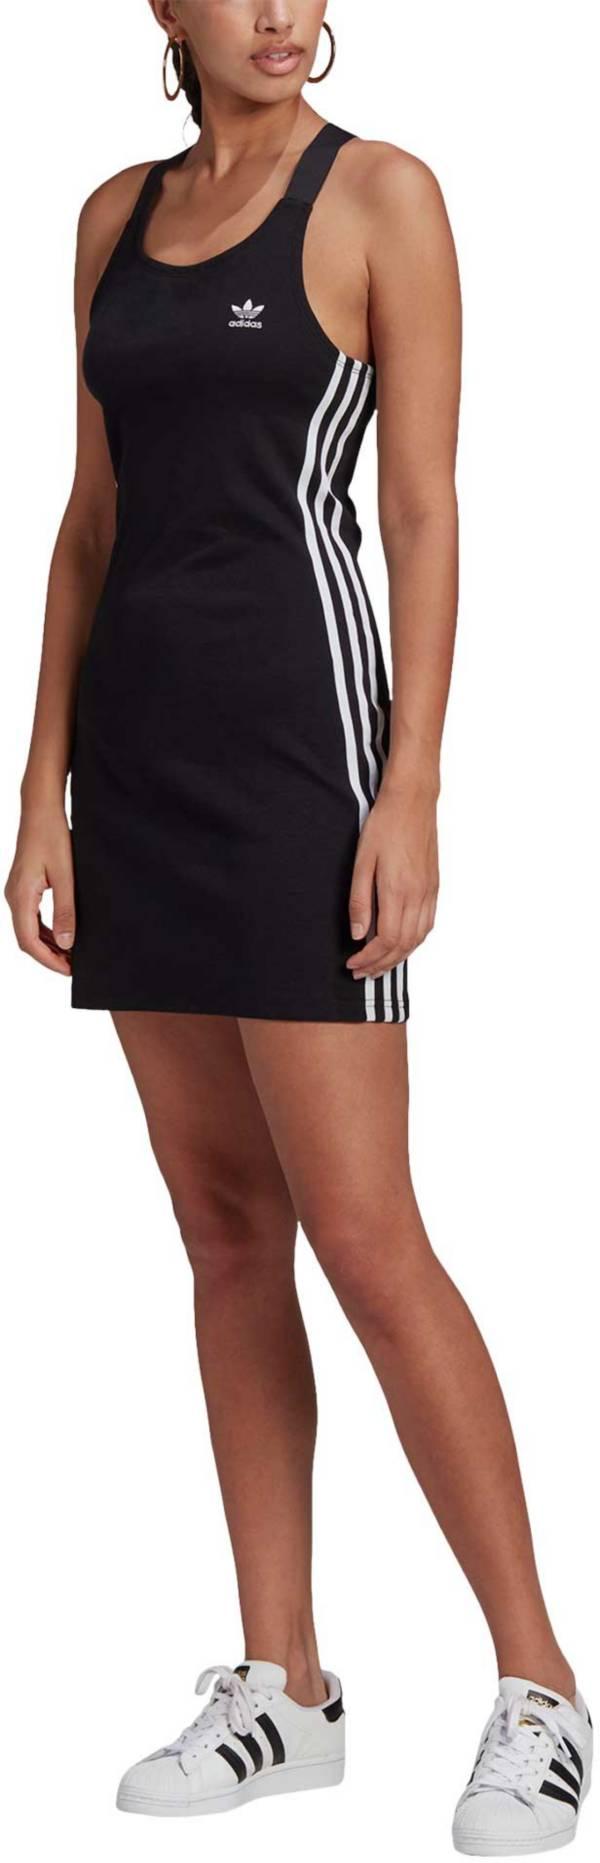 Adidas Women's Racer Back Dress product image